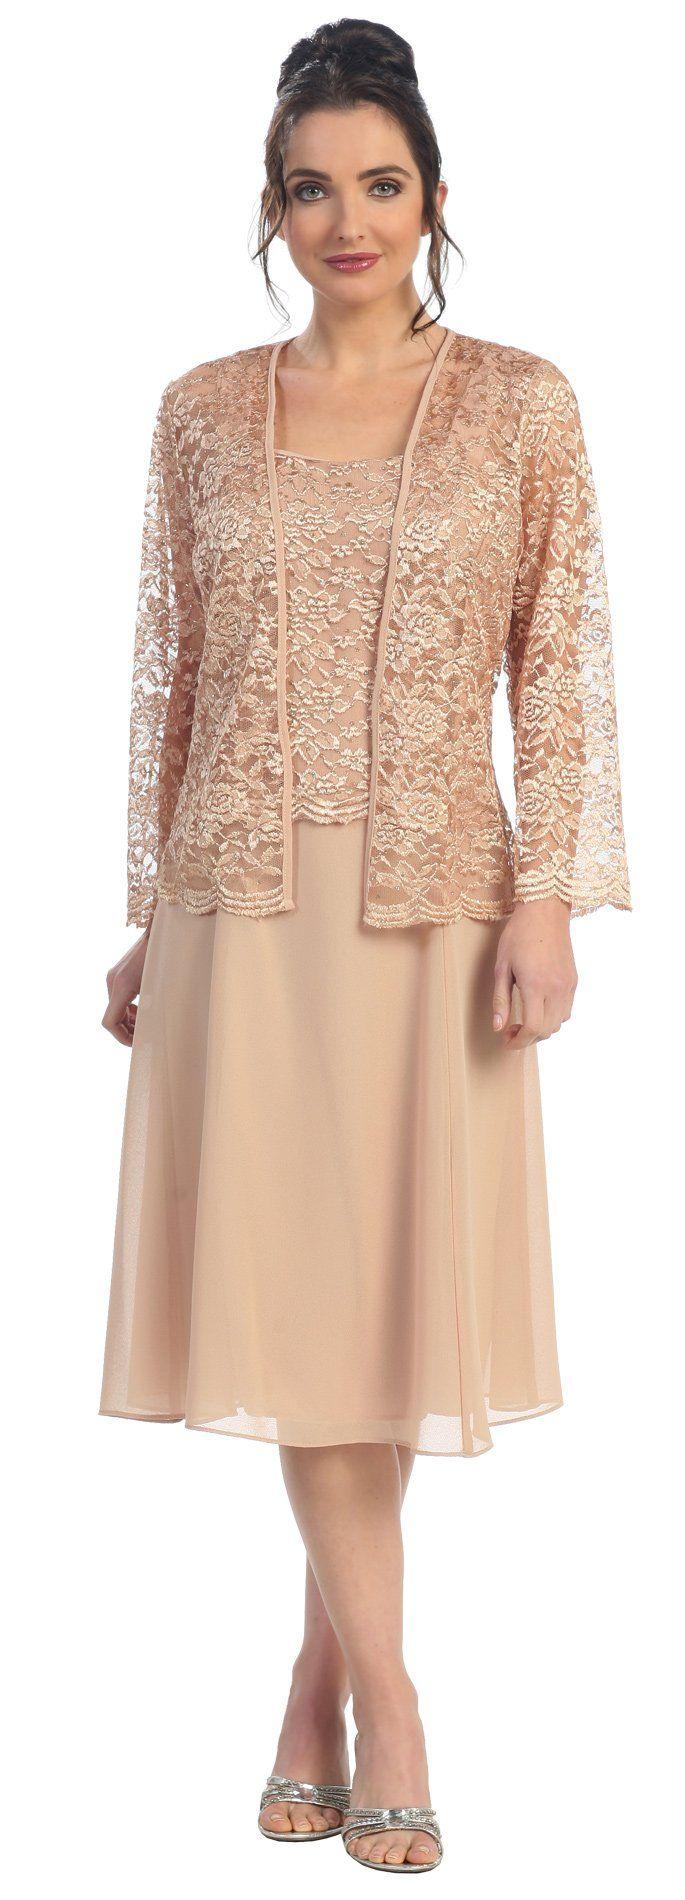 Mother of Groom Dresses Short | Short Gold Mother of Groom Dress Chiffon Knee Length Lace Jacket (7 ...